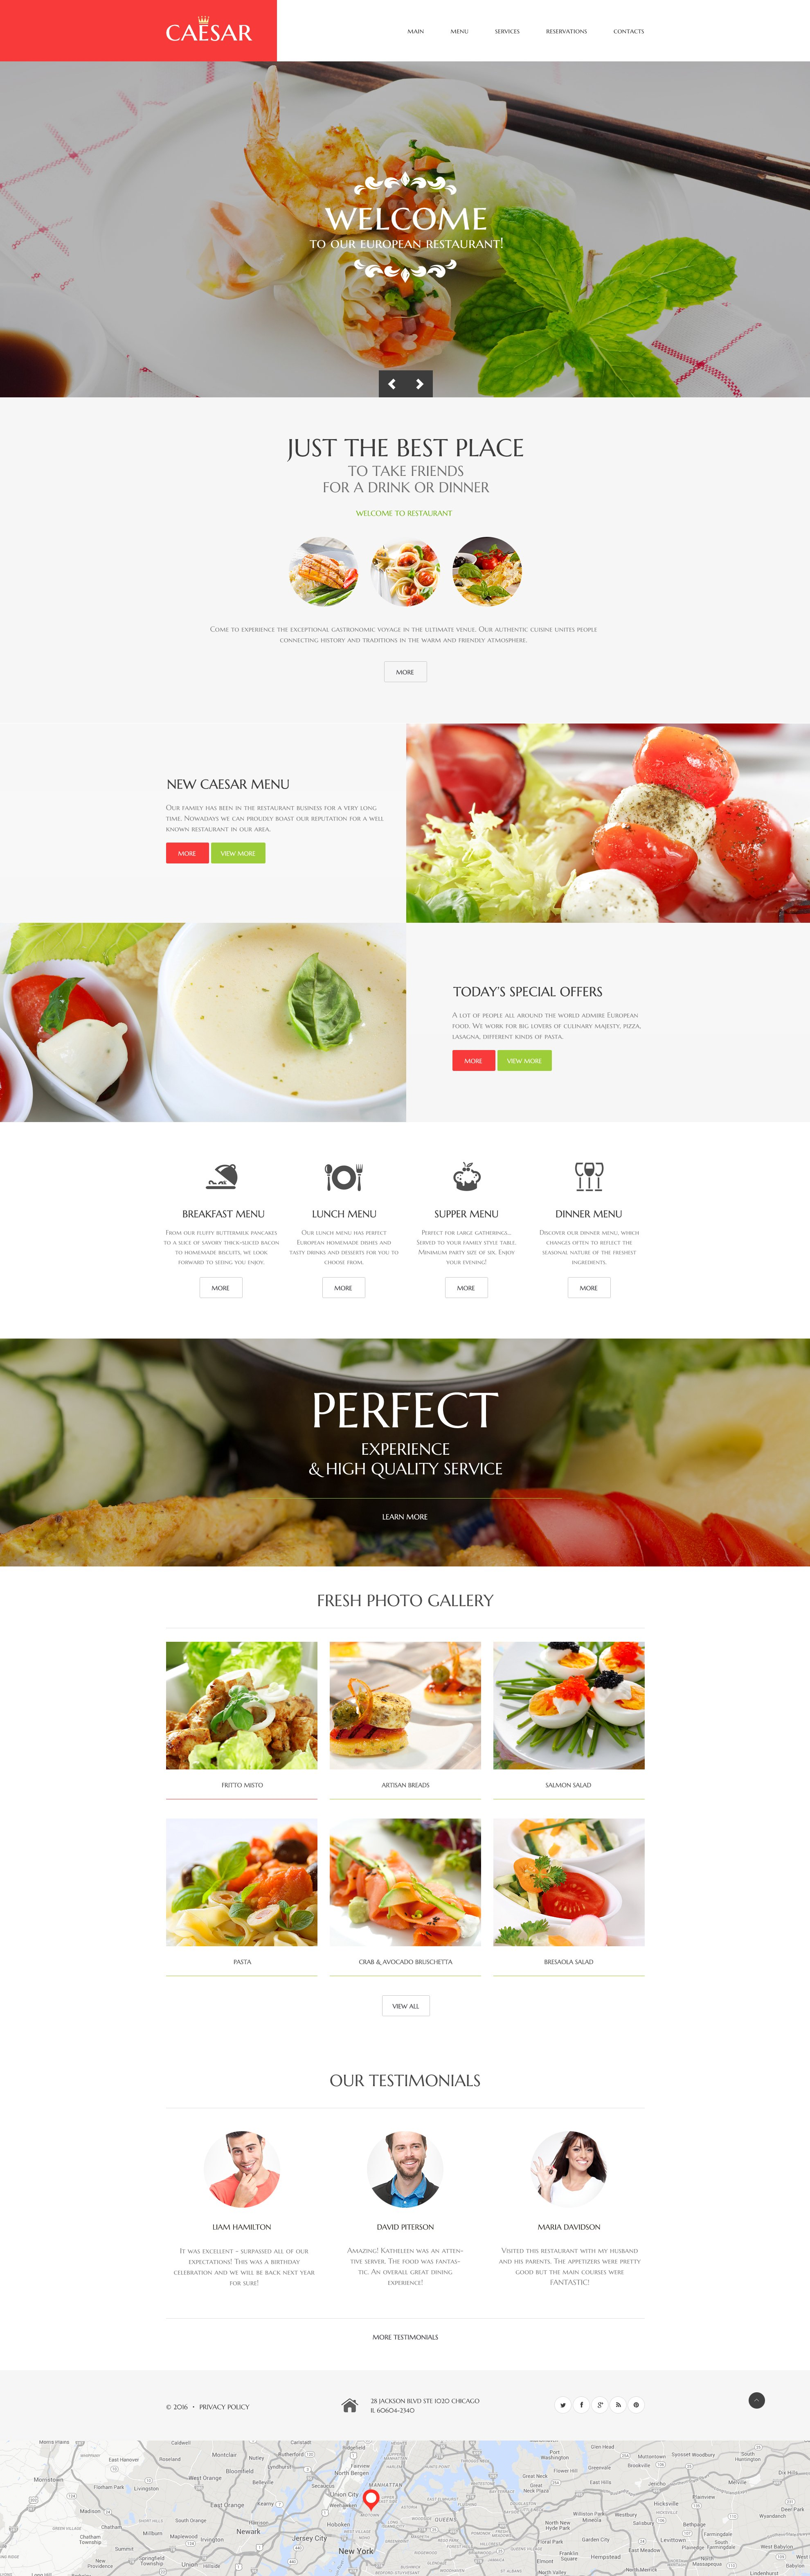 Адаптивный HTML шаблон №58582 на тему кафе и ресторан - скриншот